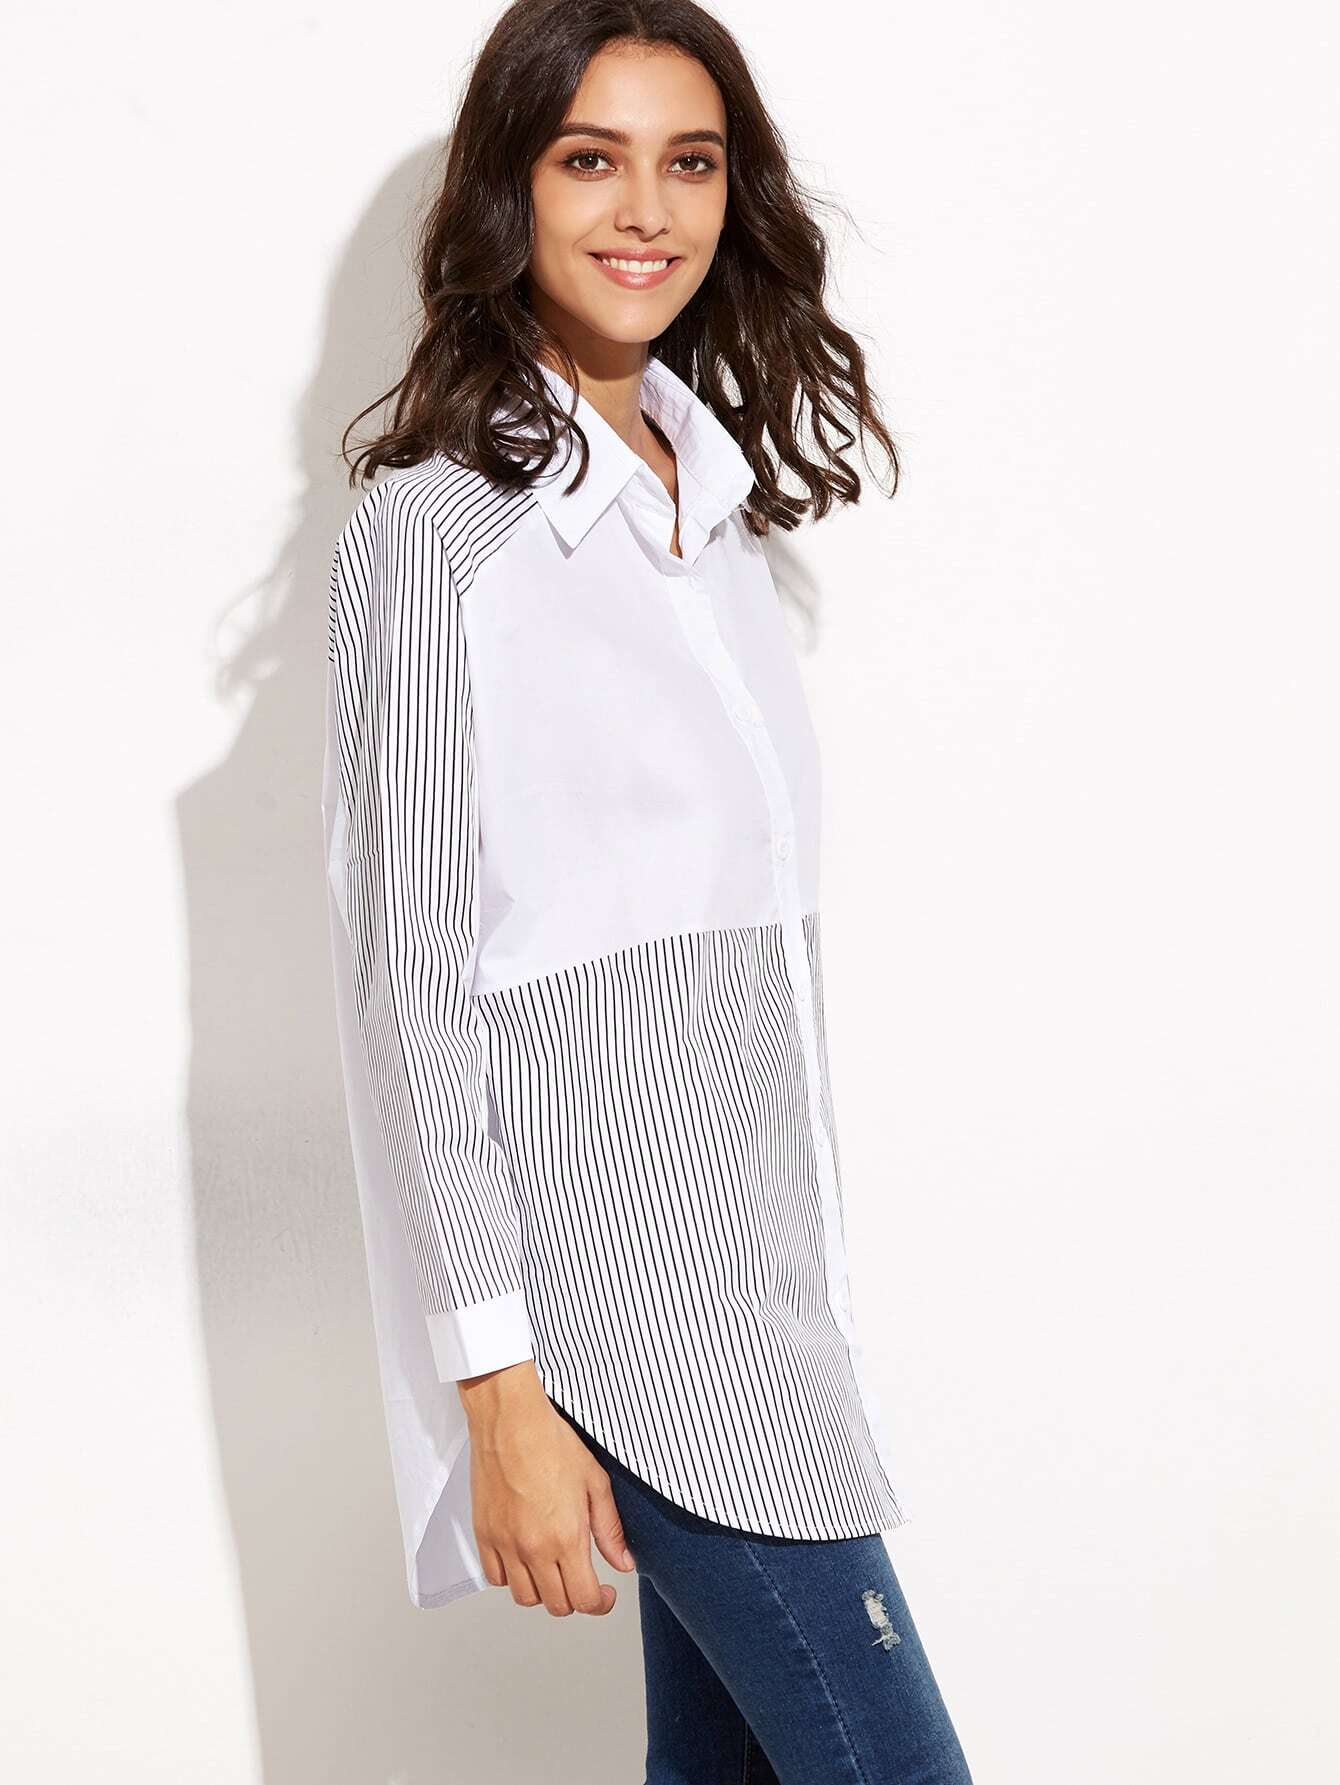 blouse160901103_2